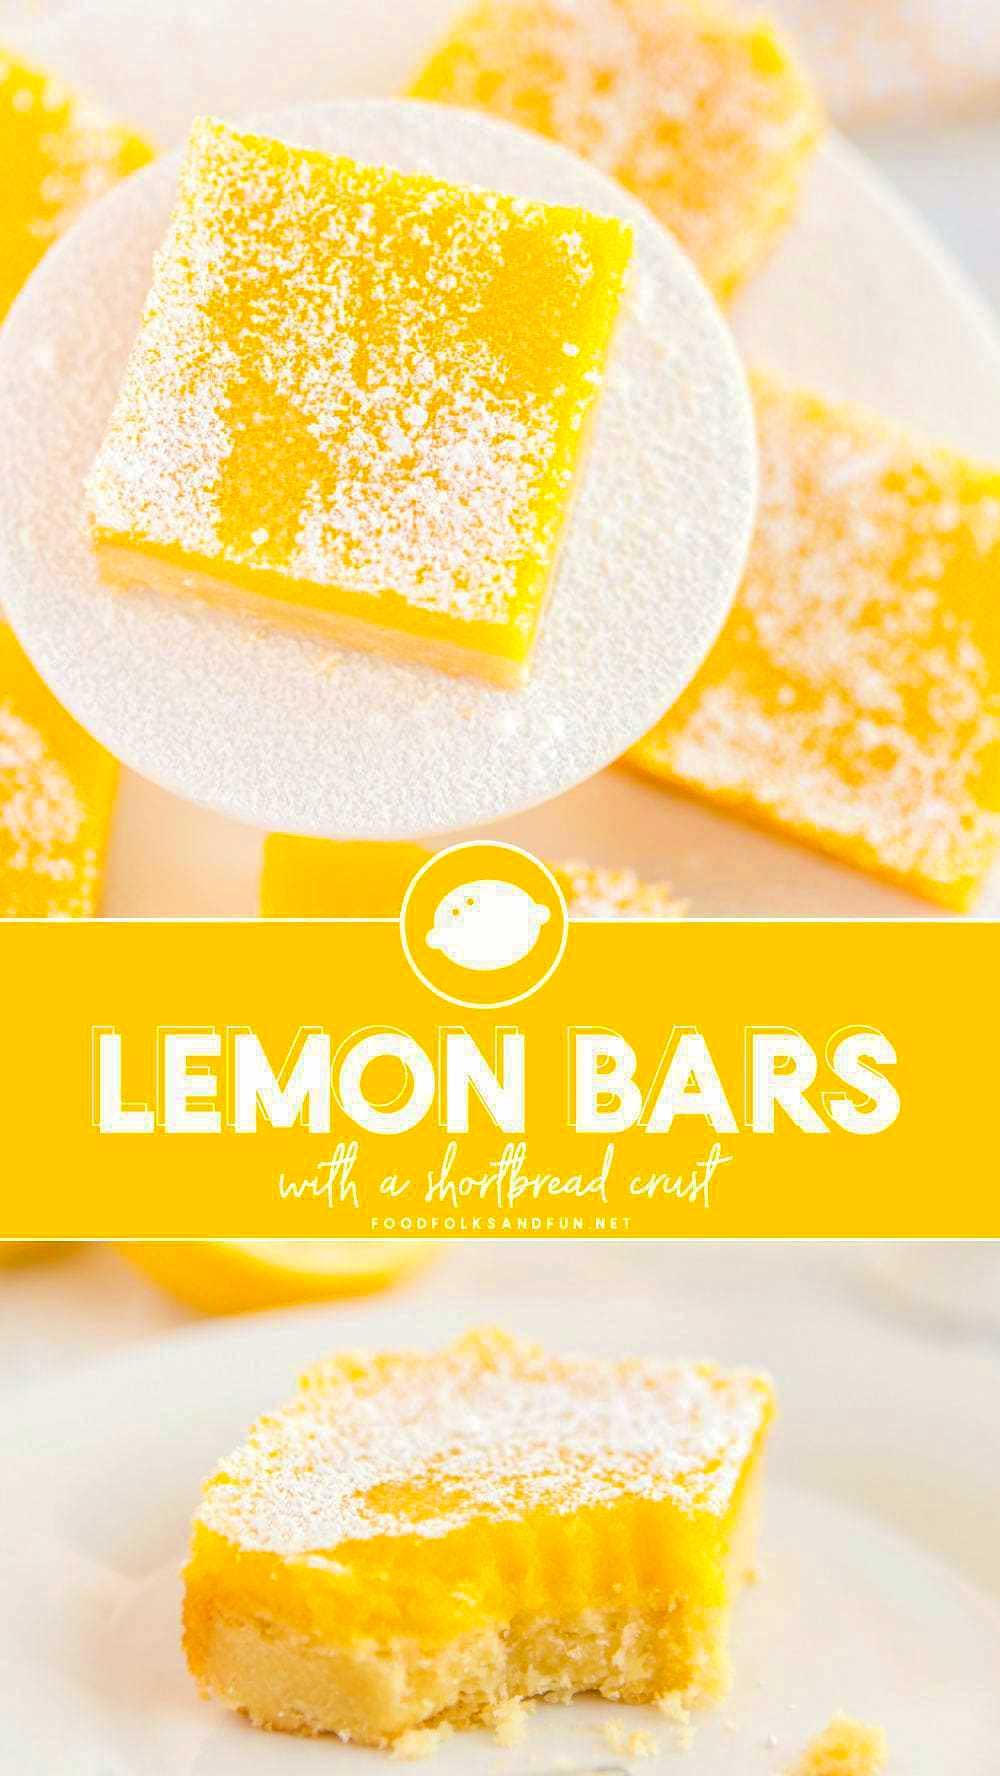 Zesty Lemon Bars with a shortbread crust.